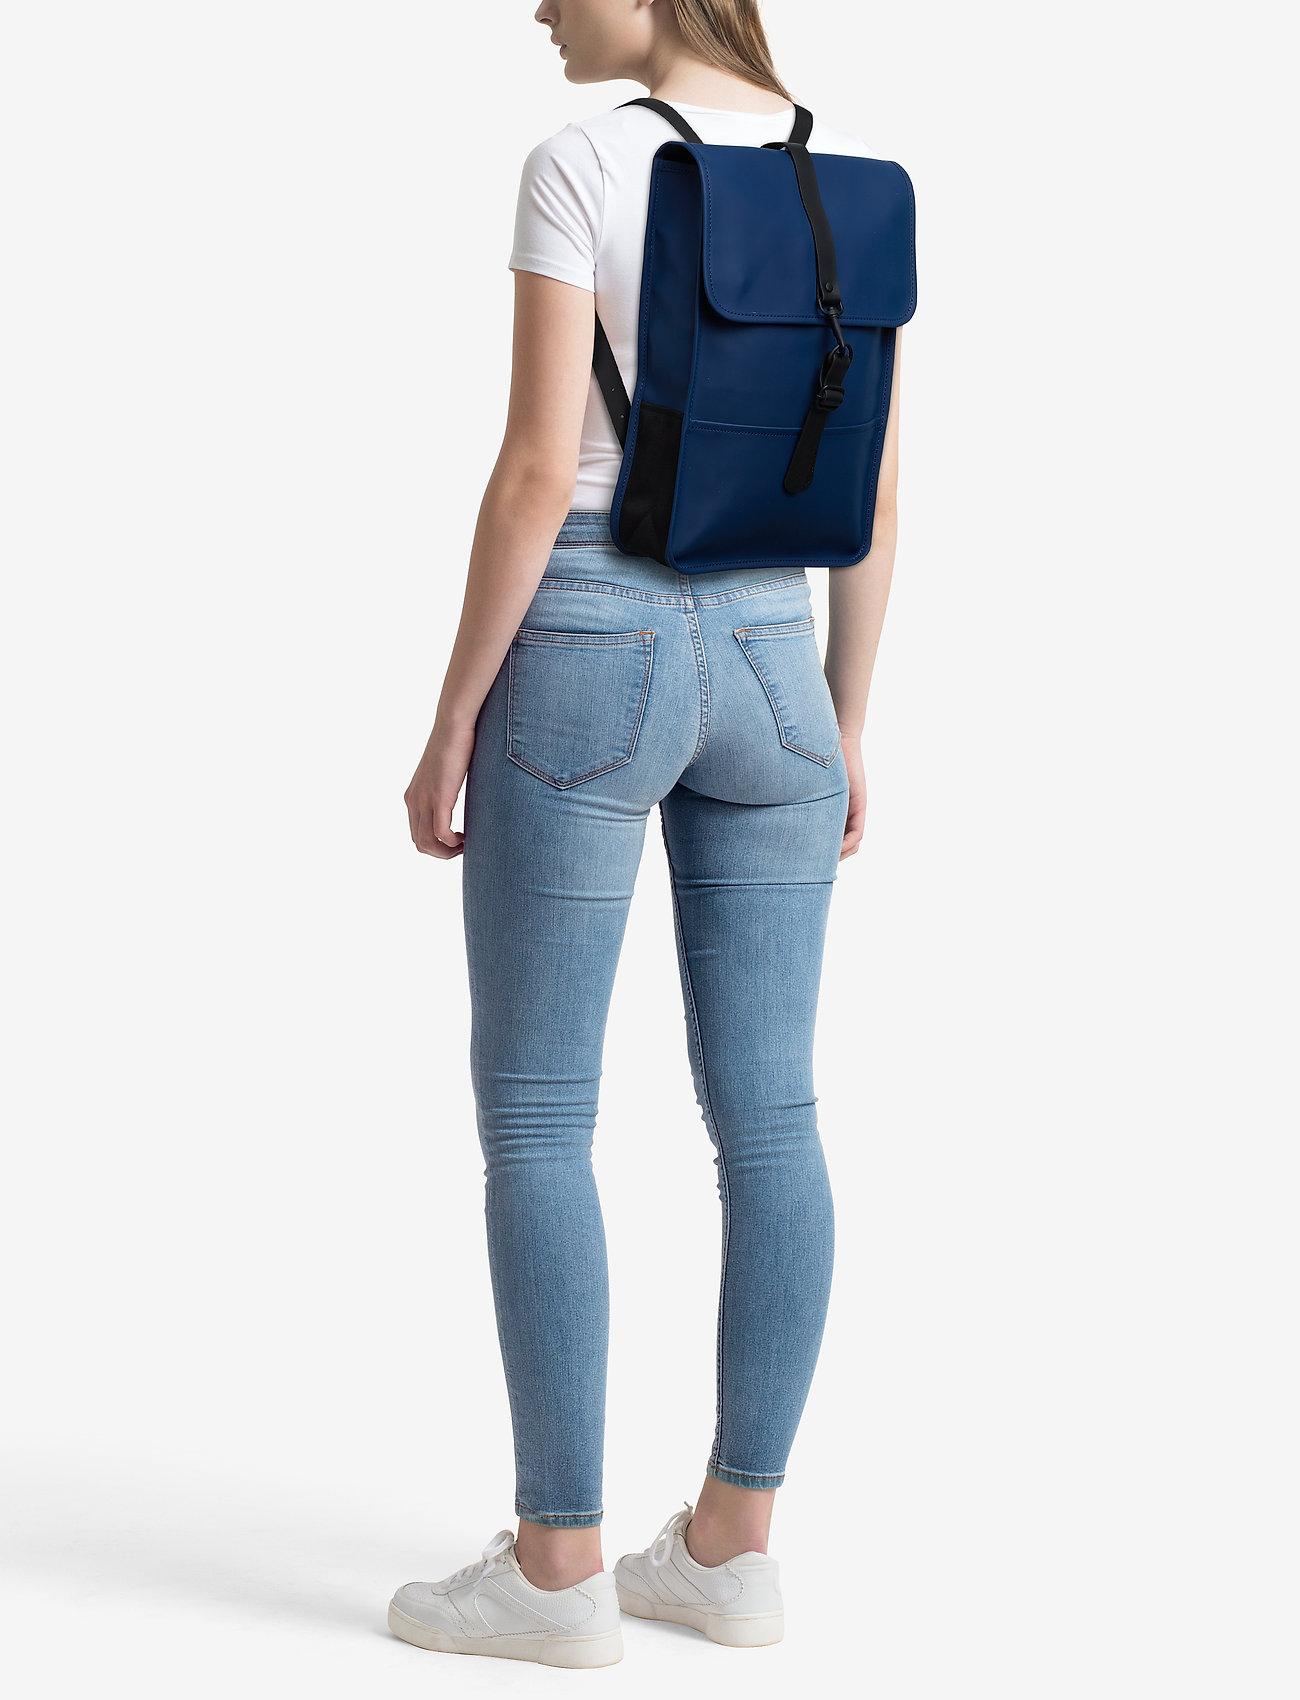 Rains Backpack Mini - KLEIN BLUE